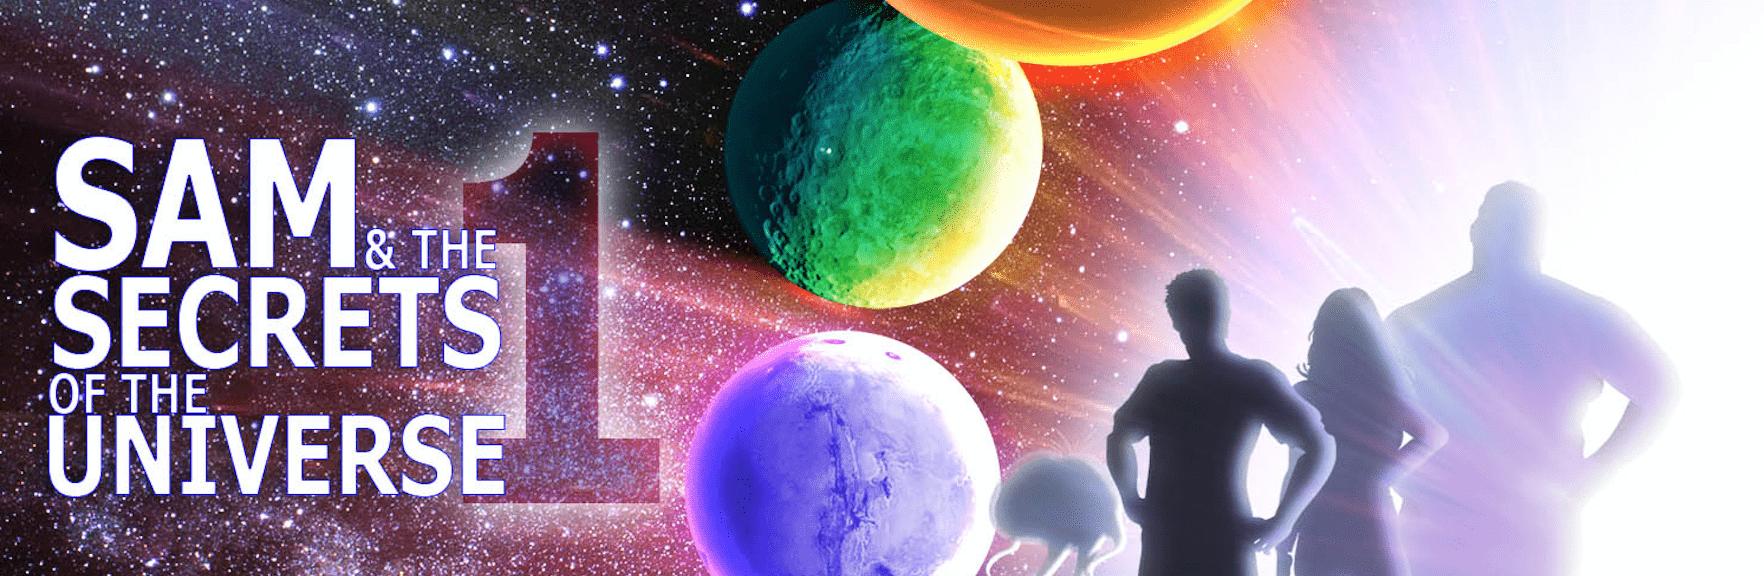 New Book Trailer: Sam & The Secrets of the Universe